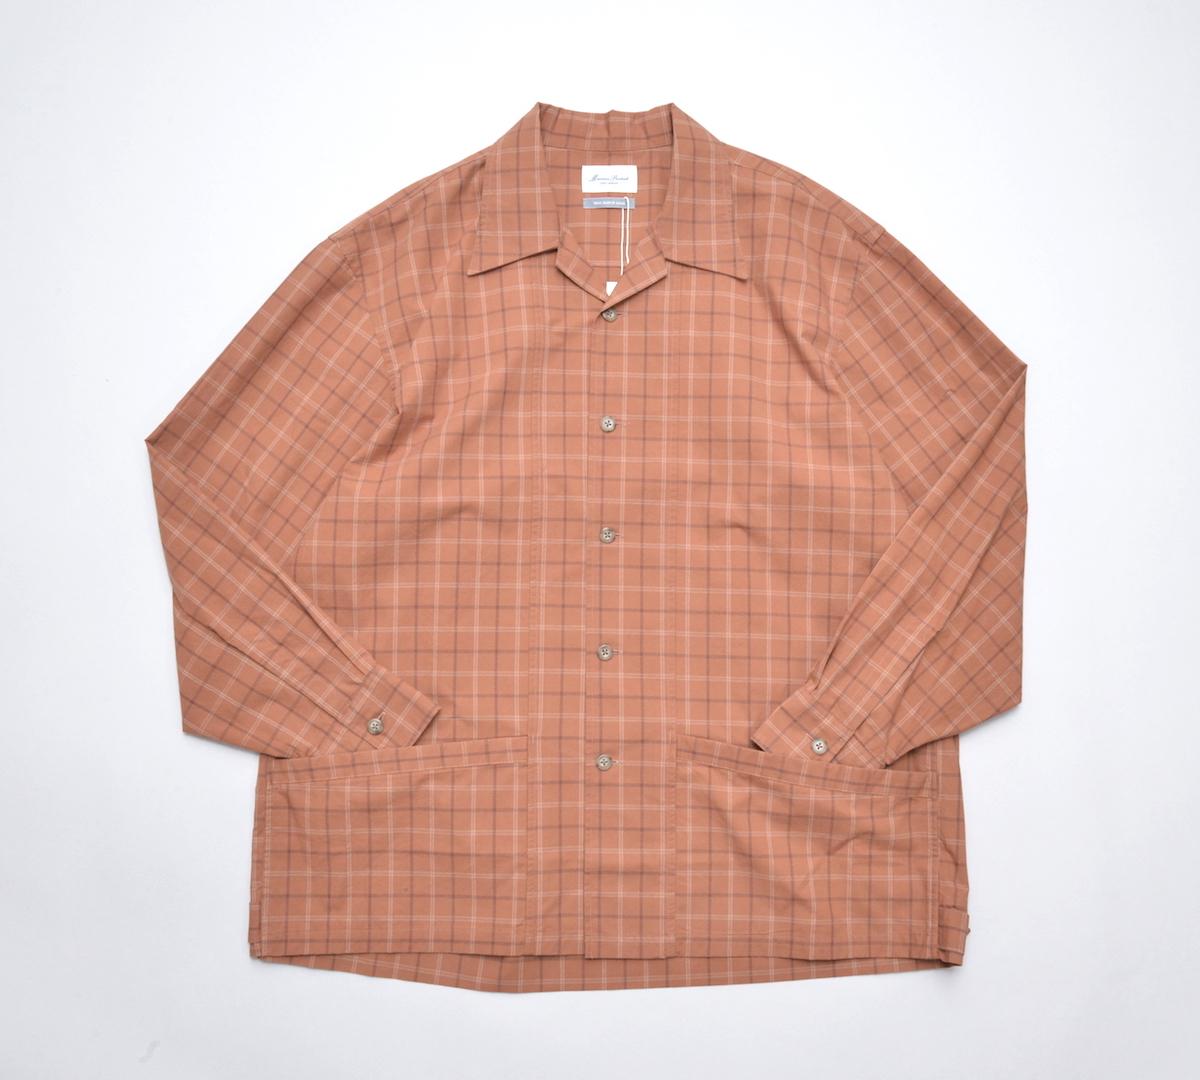 Marvine Pontiak shirt makers 「 Drizzler SH - Brick CH 」